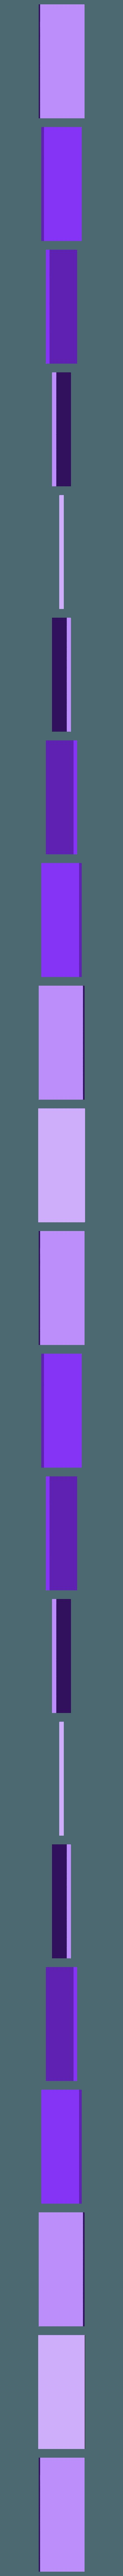 sabre2_base1.stl Download free STL file Palaeo Flats • 3D printing template, Earsling